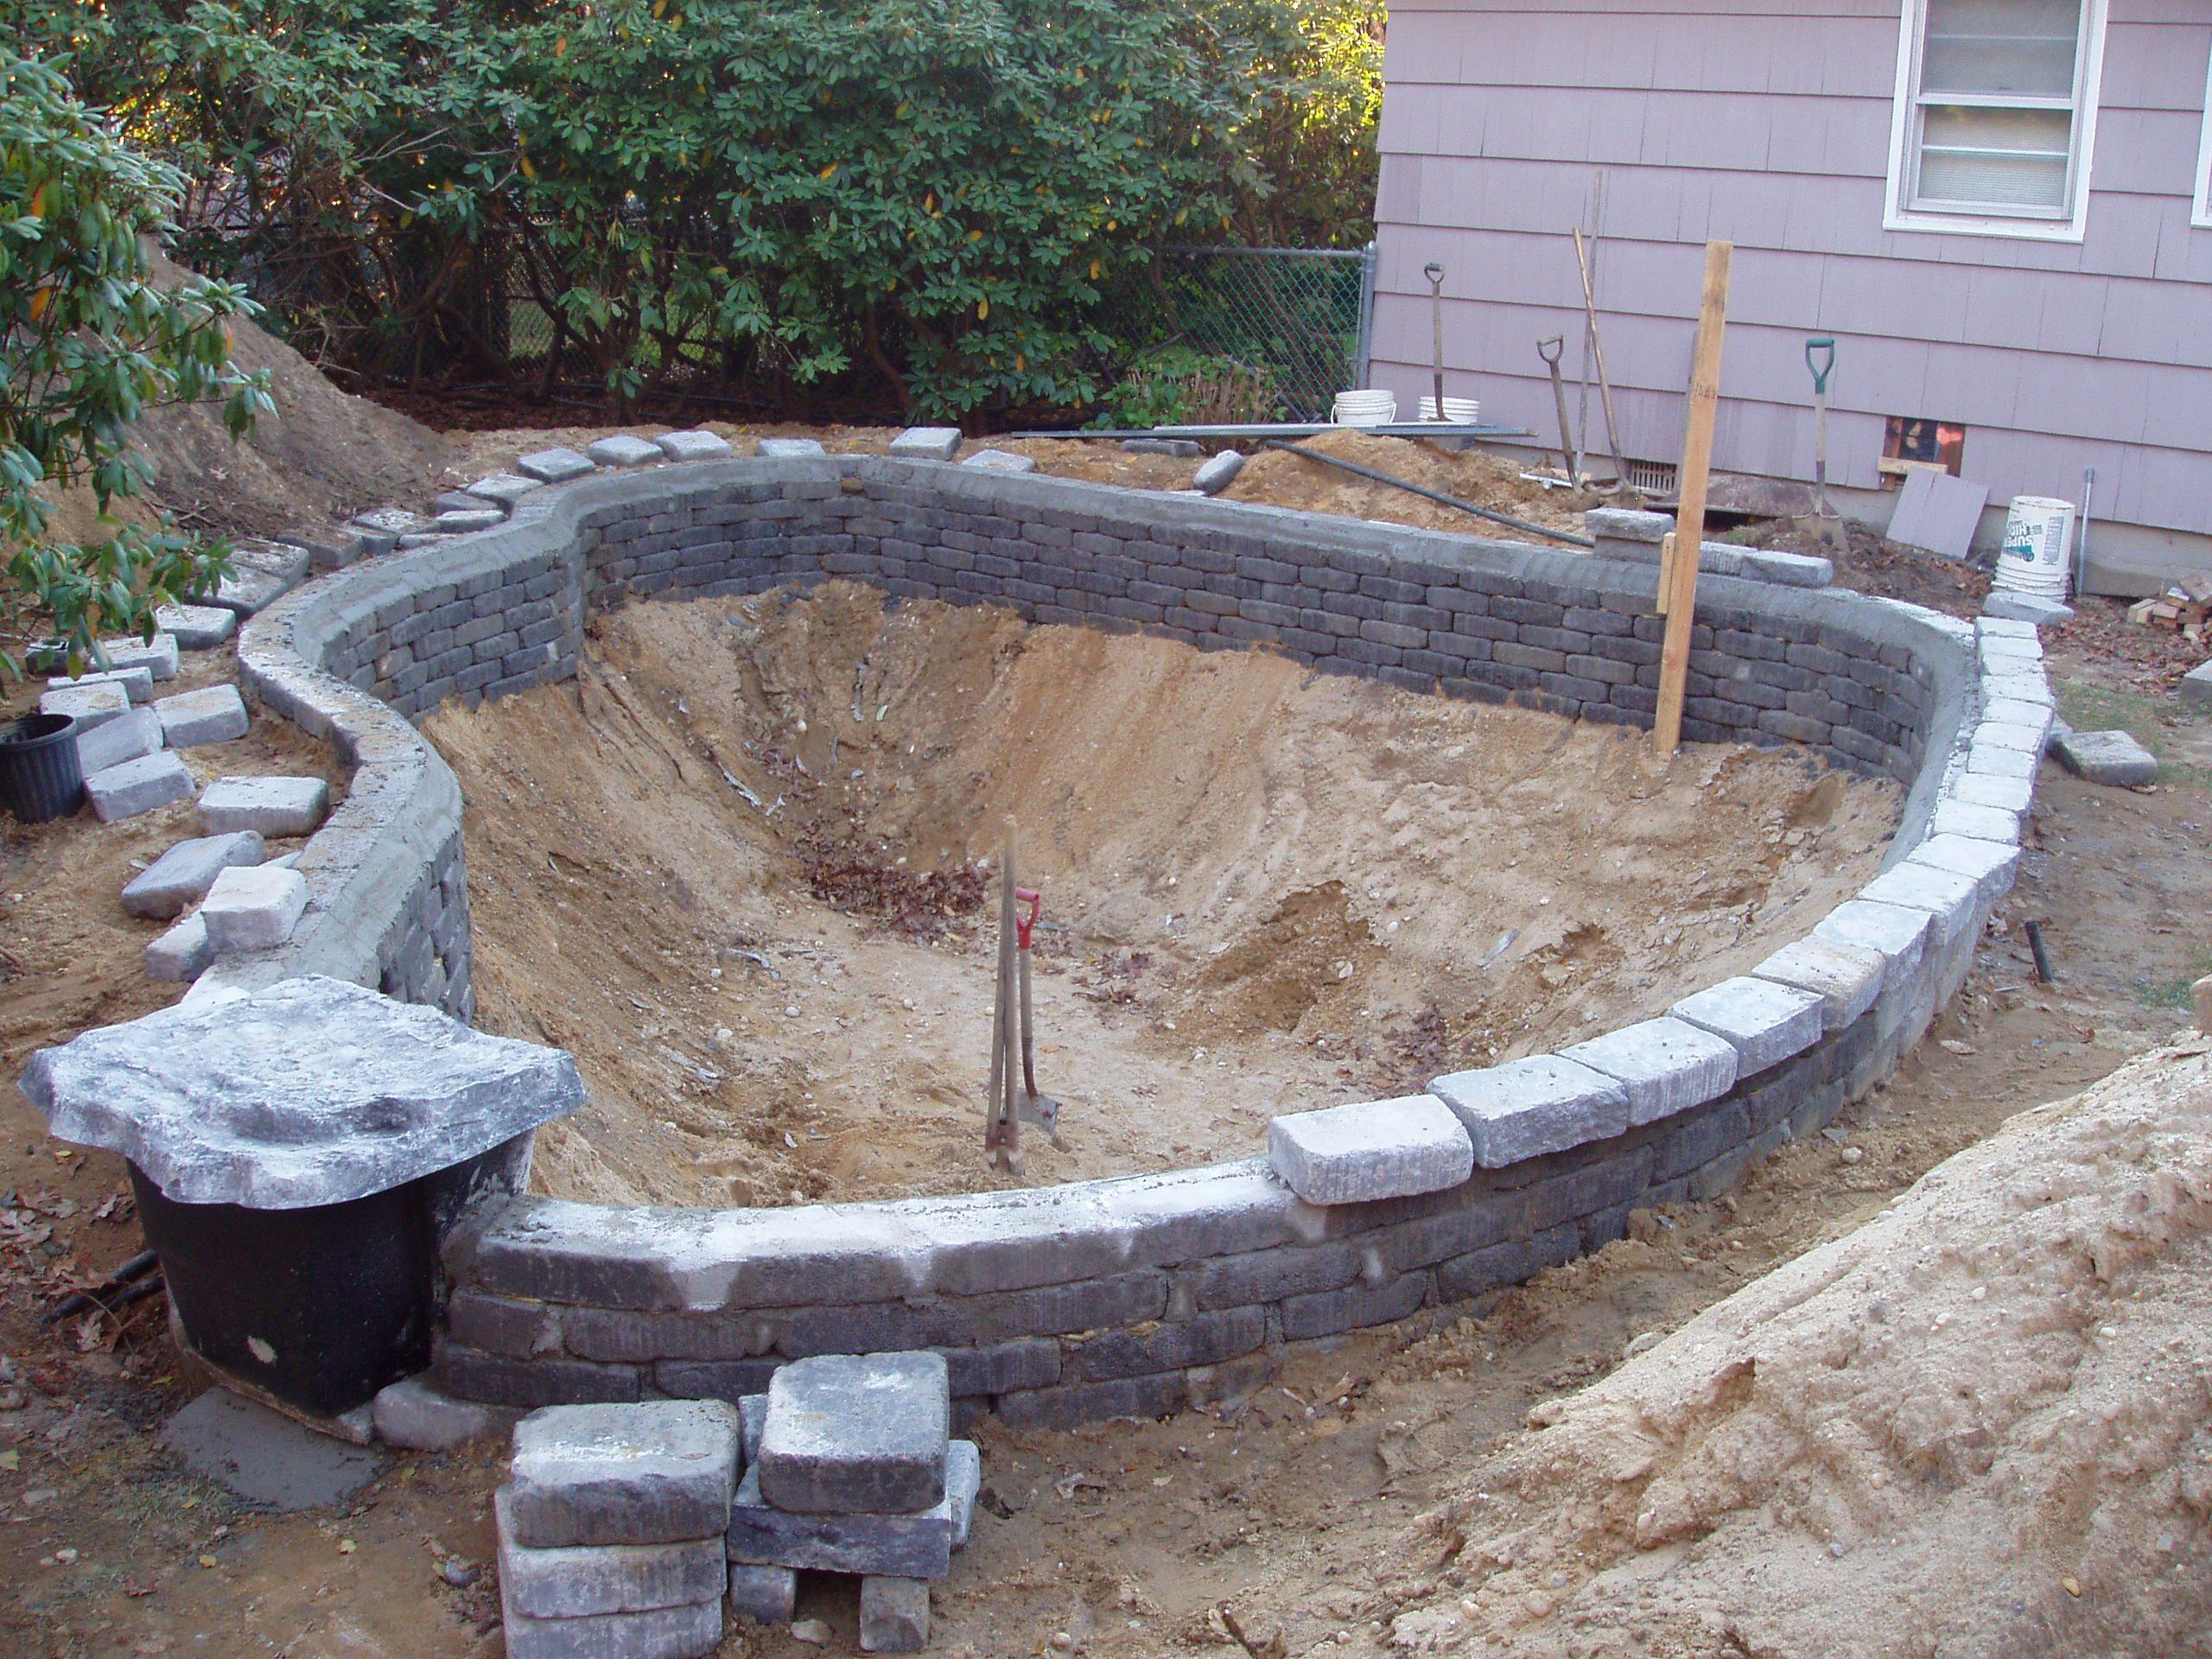 Pond Design And Construction Google Search Ponds Backyard Pond Design Aquaponics